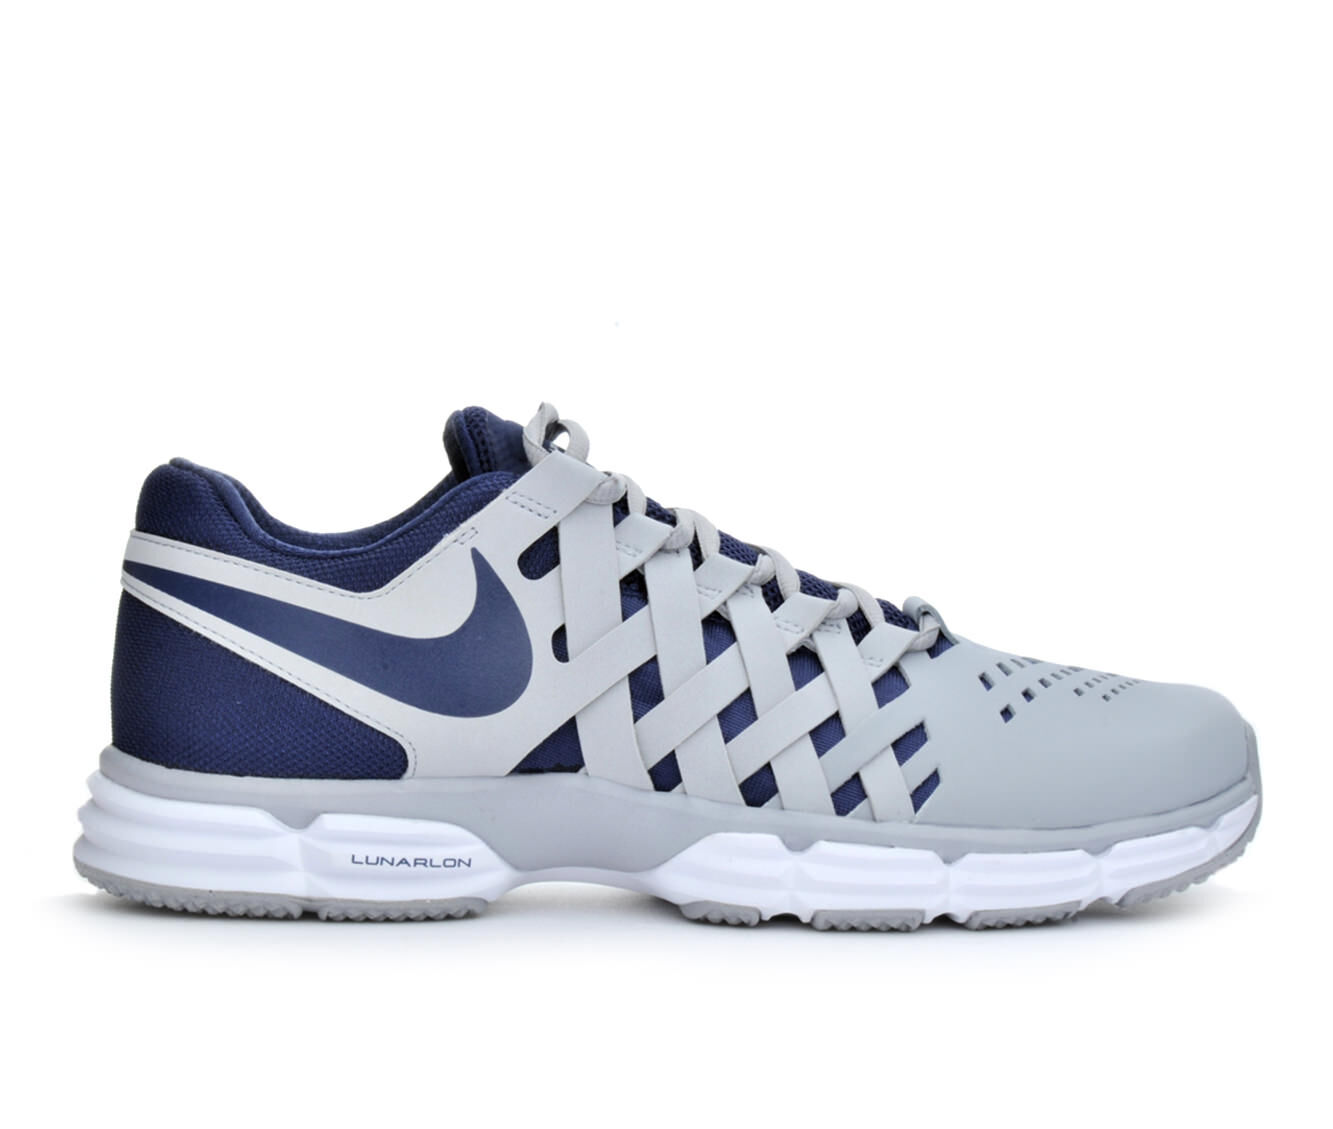 nike tennis shoes wide width